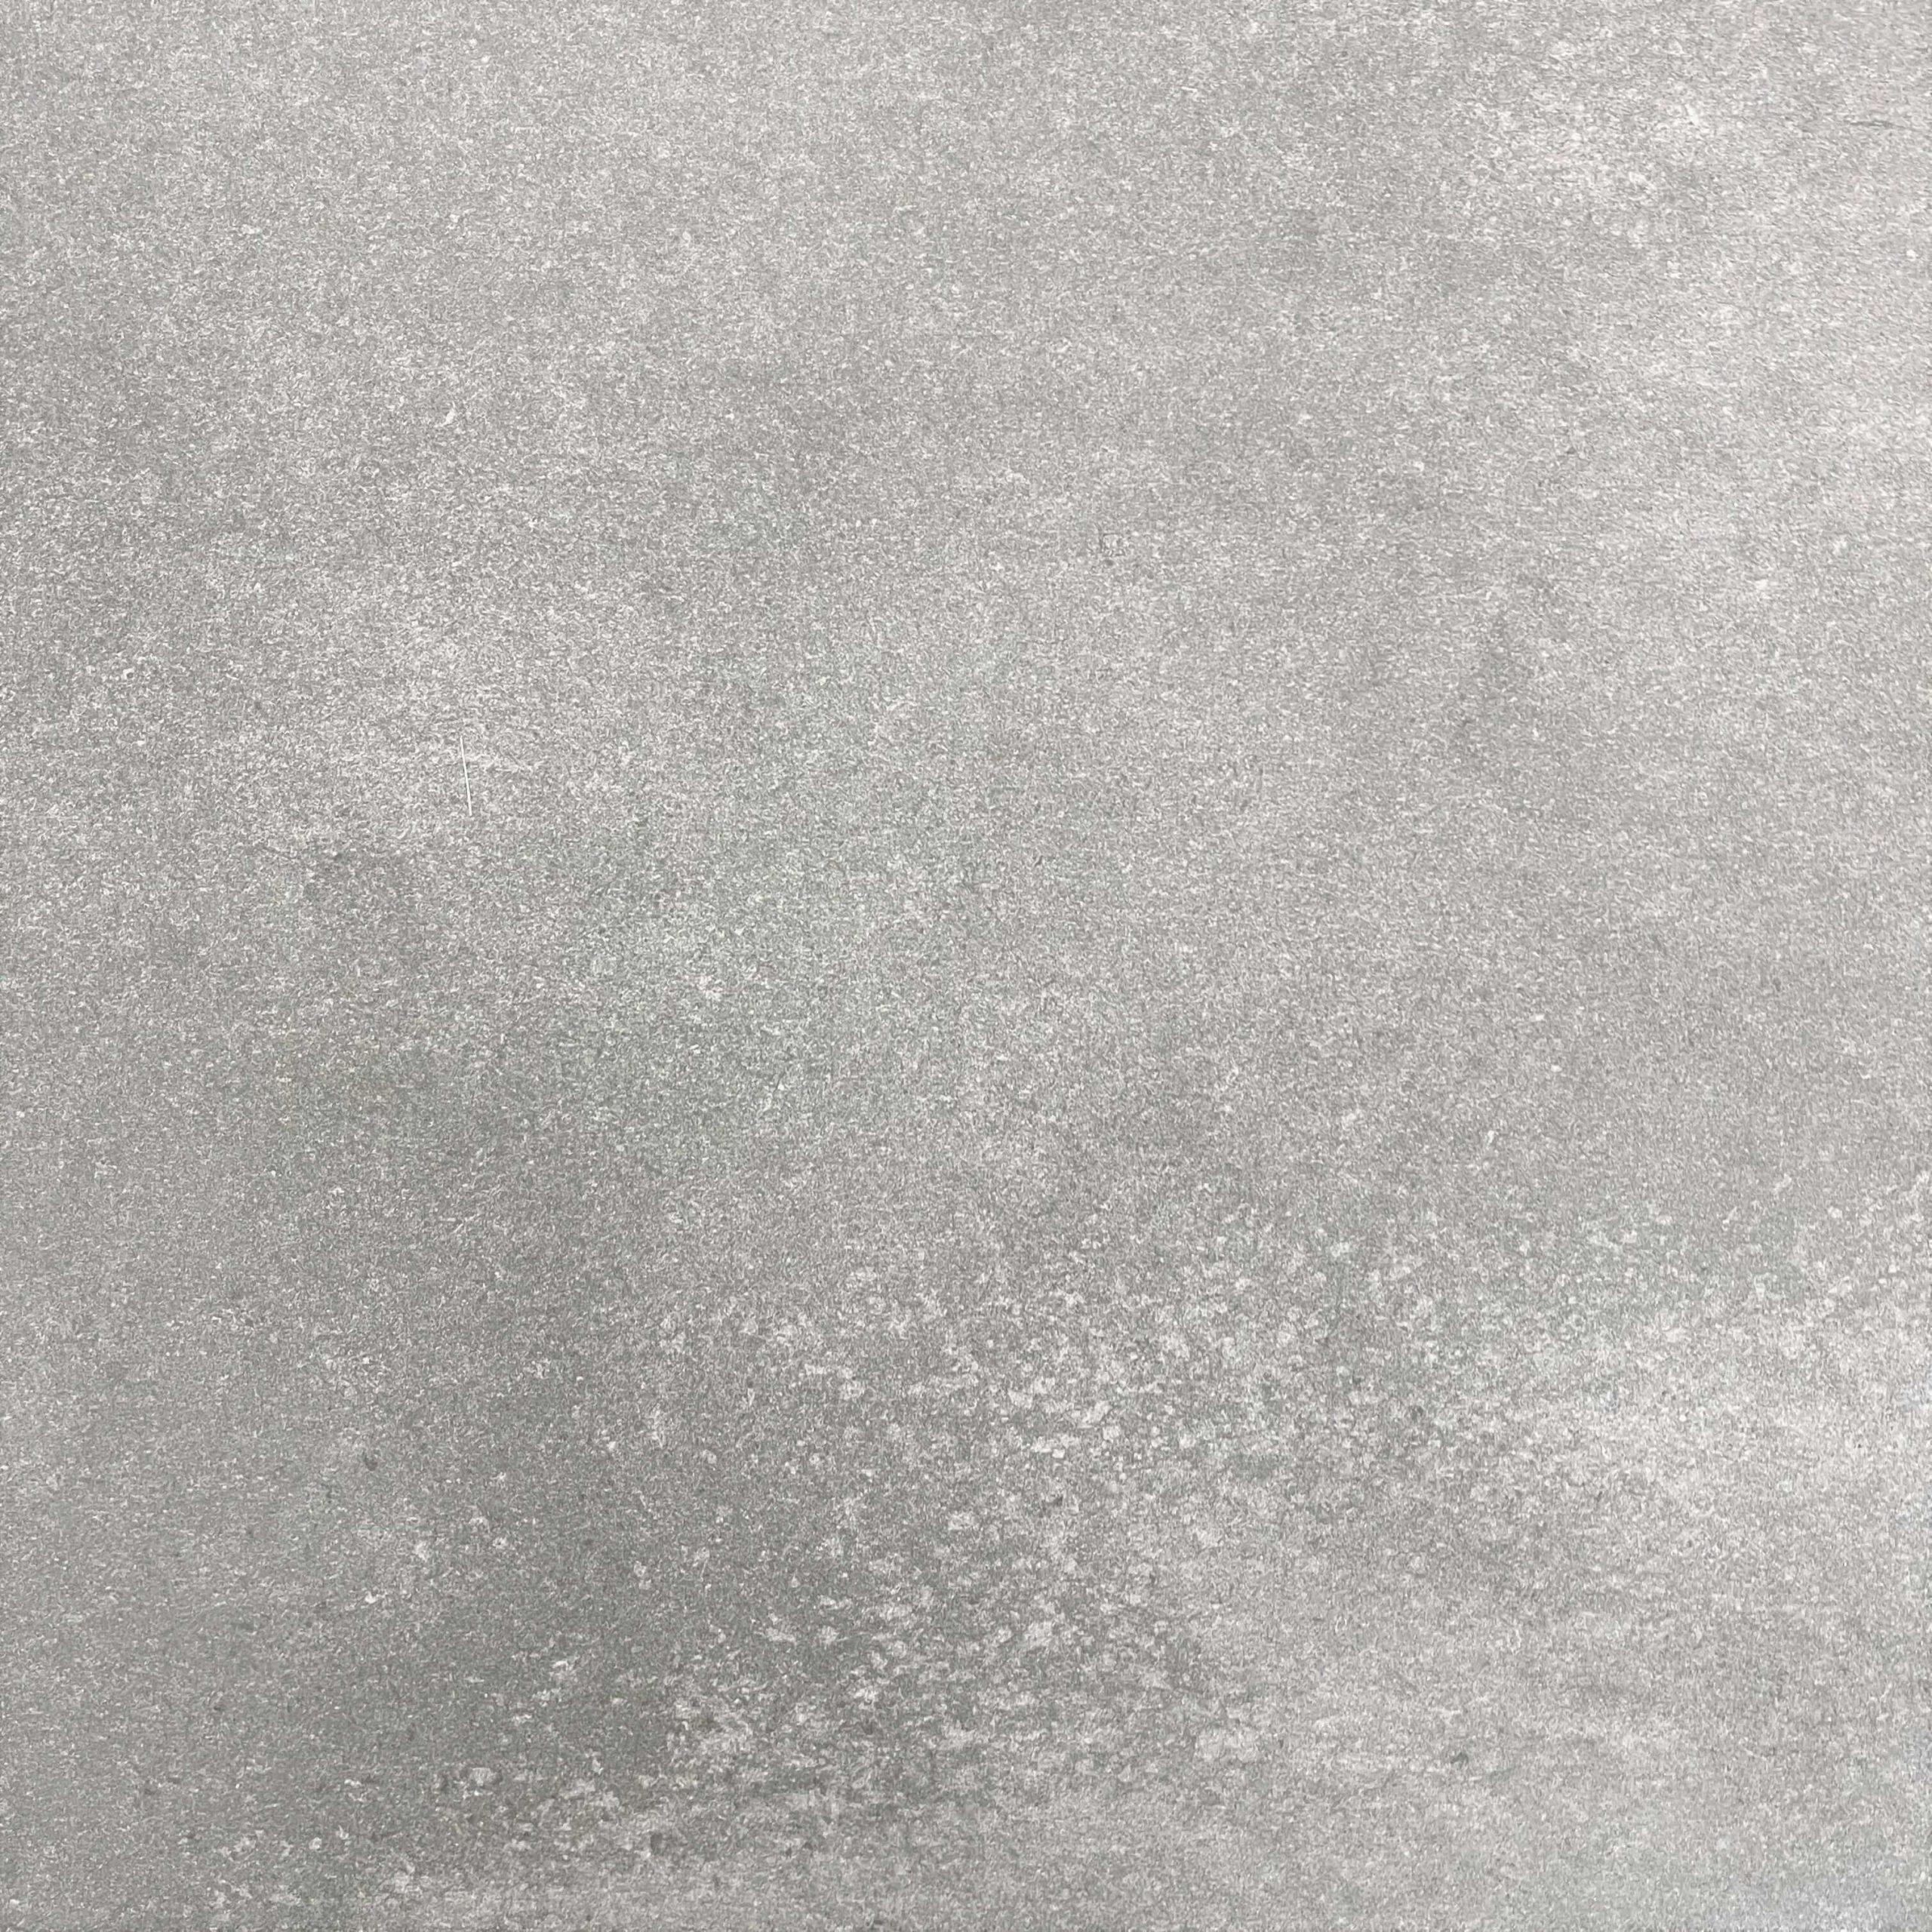 Concrete Look Light Grey Matt Finish Rectified Spanish Tile 3712